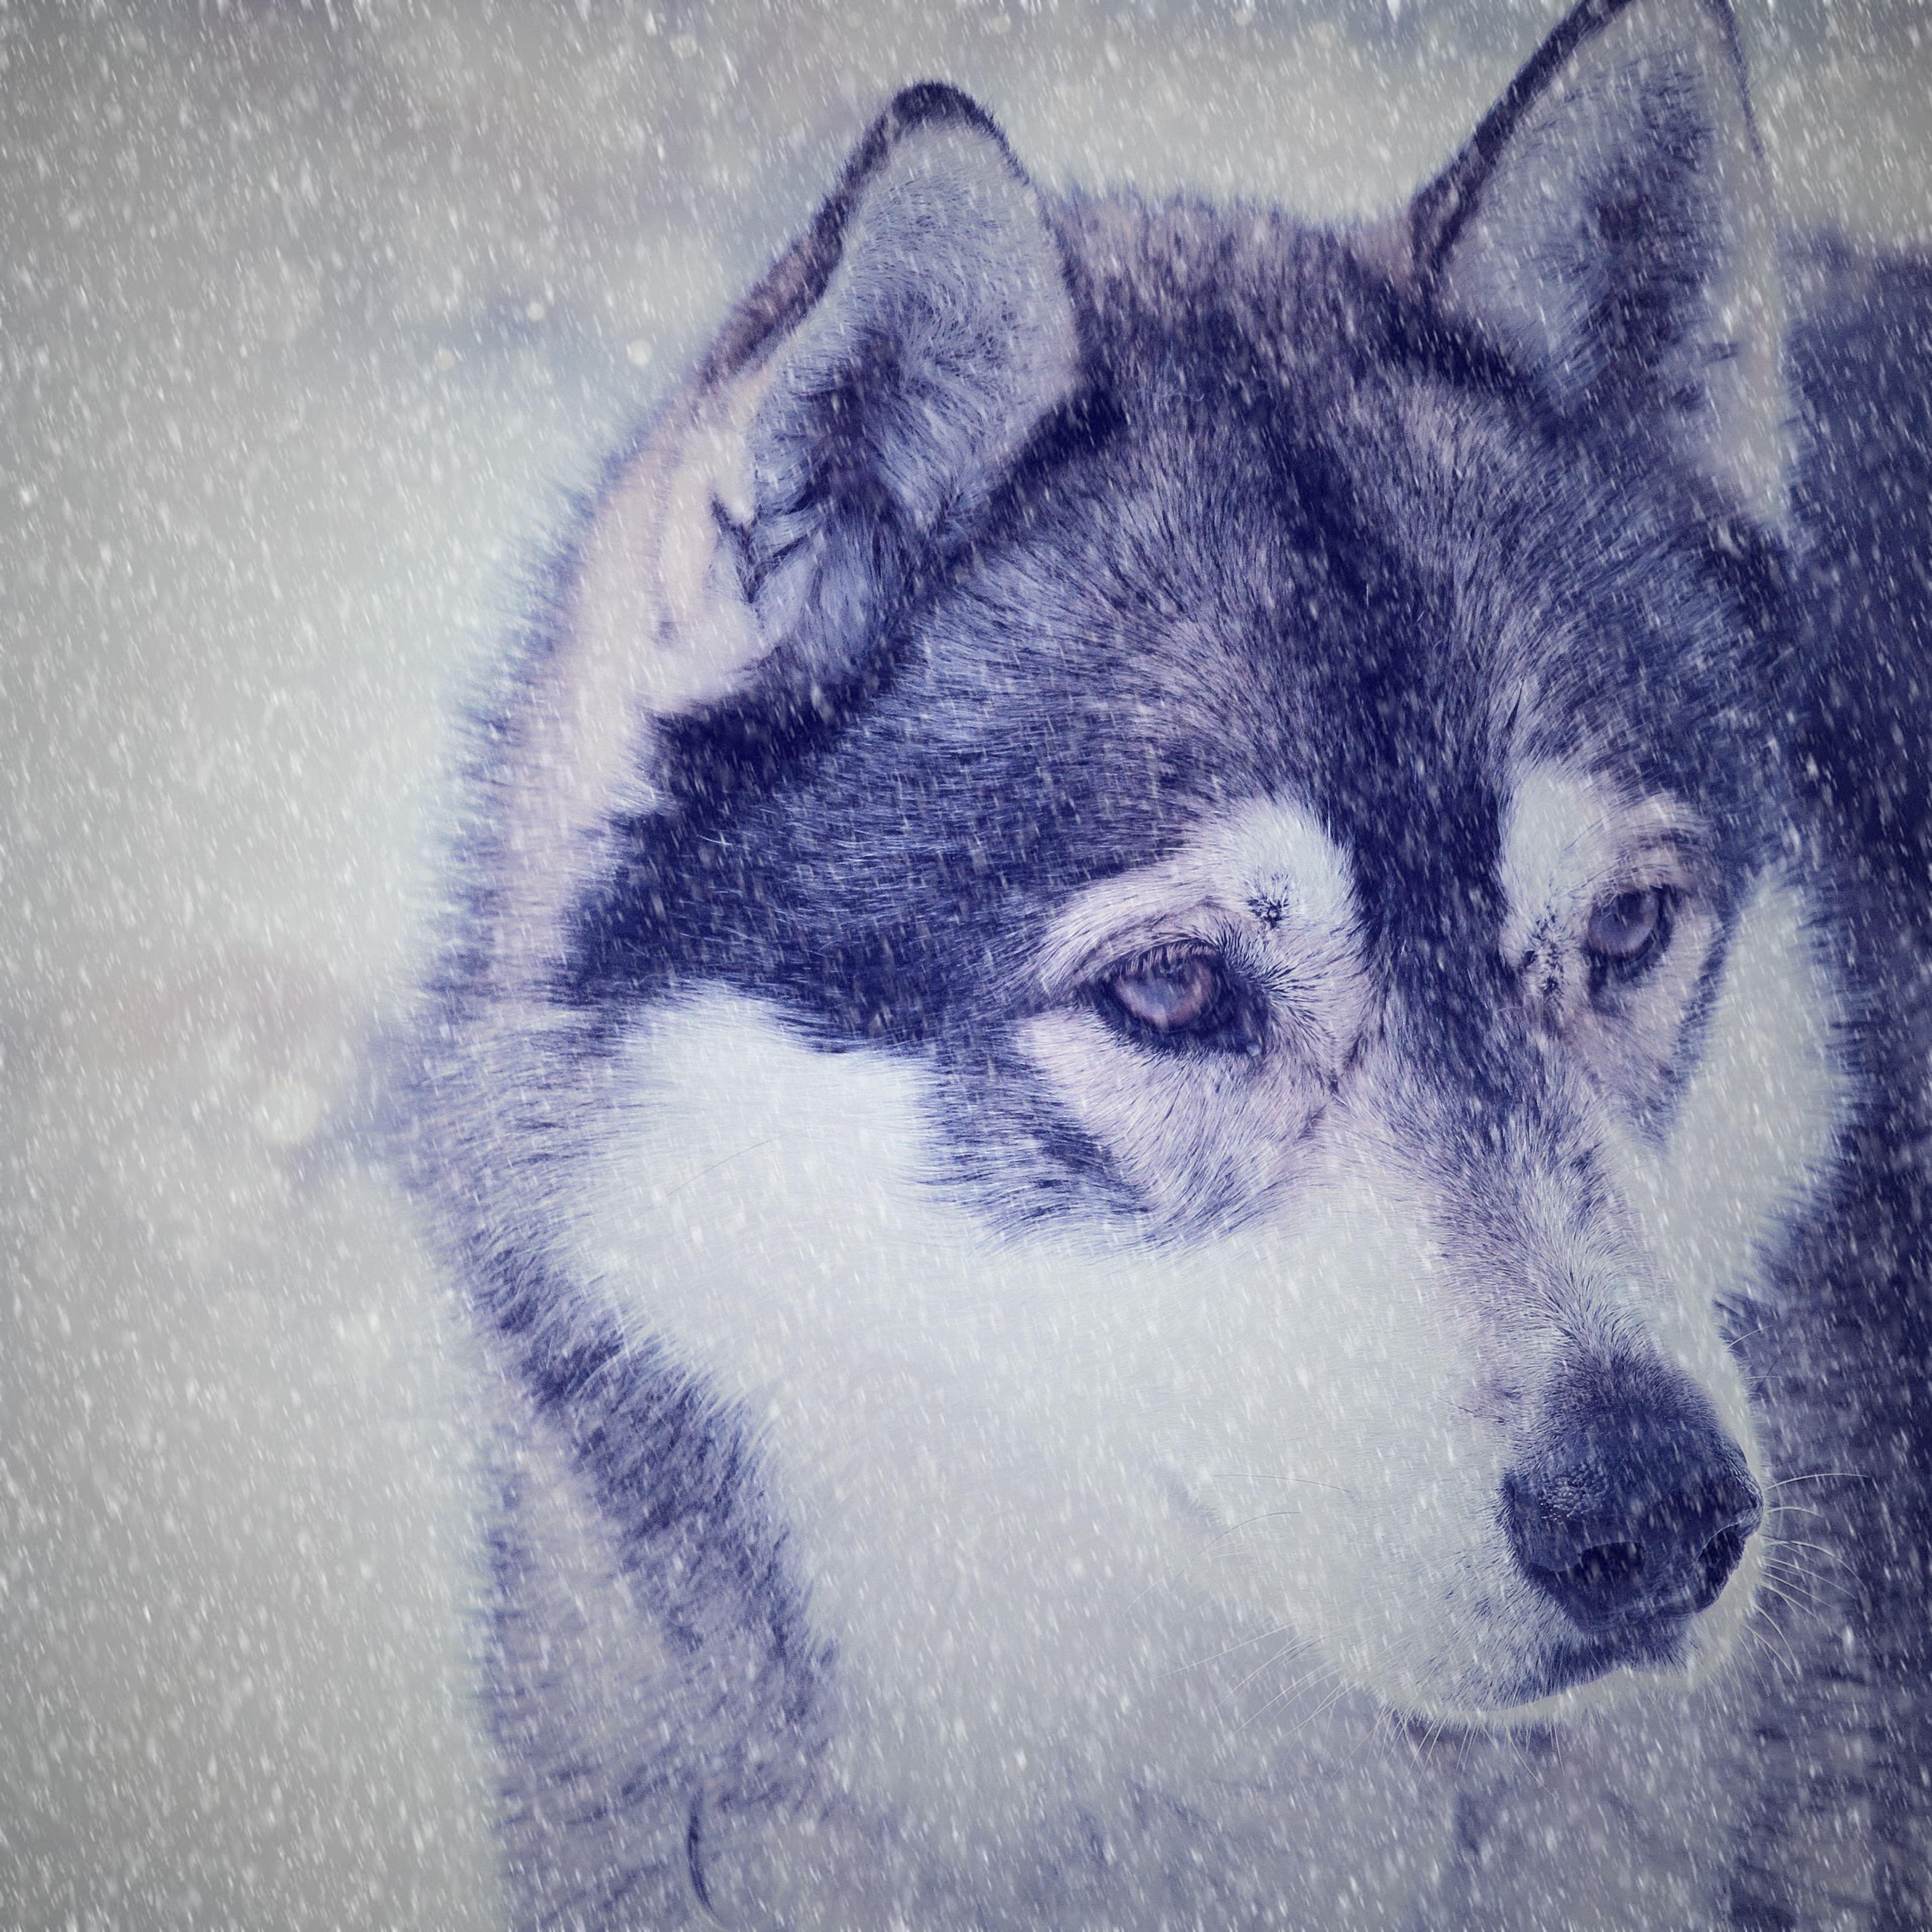 Gambar Salju Musim Dingin Melihat Binatang Menyusui Serigala